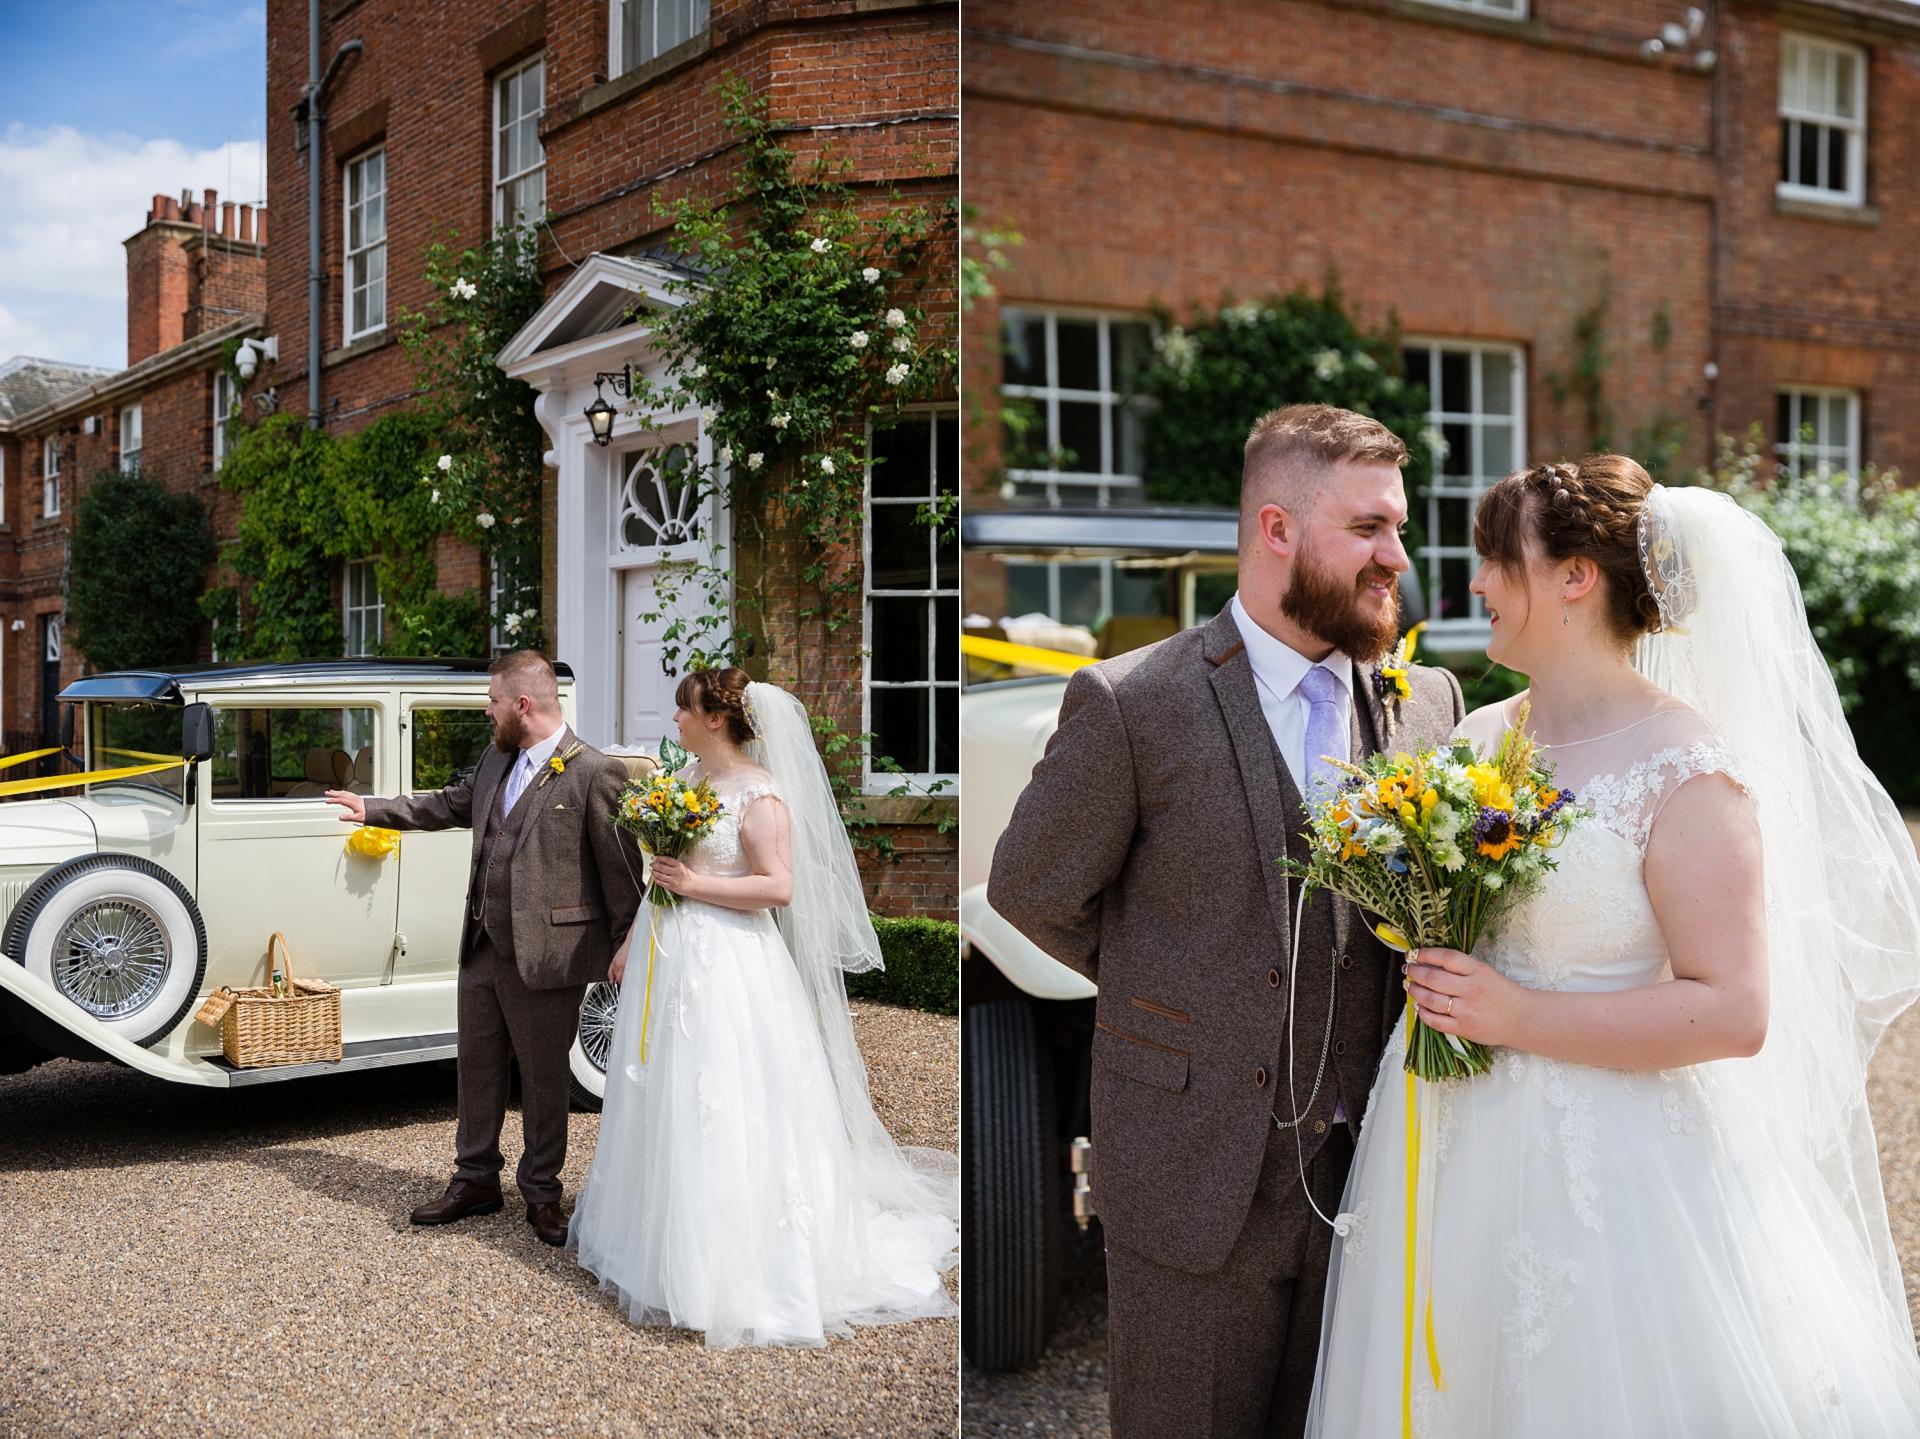 Beautiful natural wedding photography